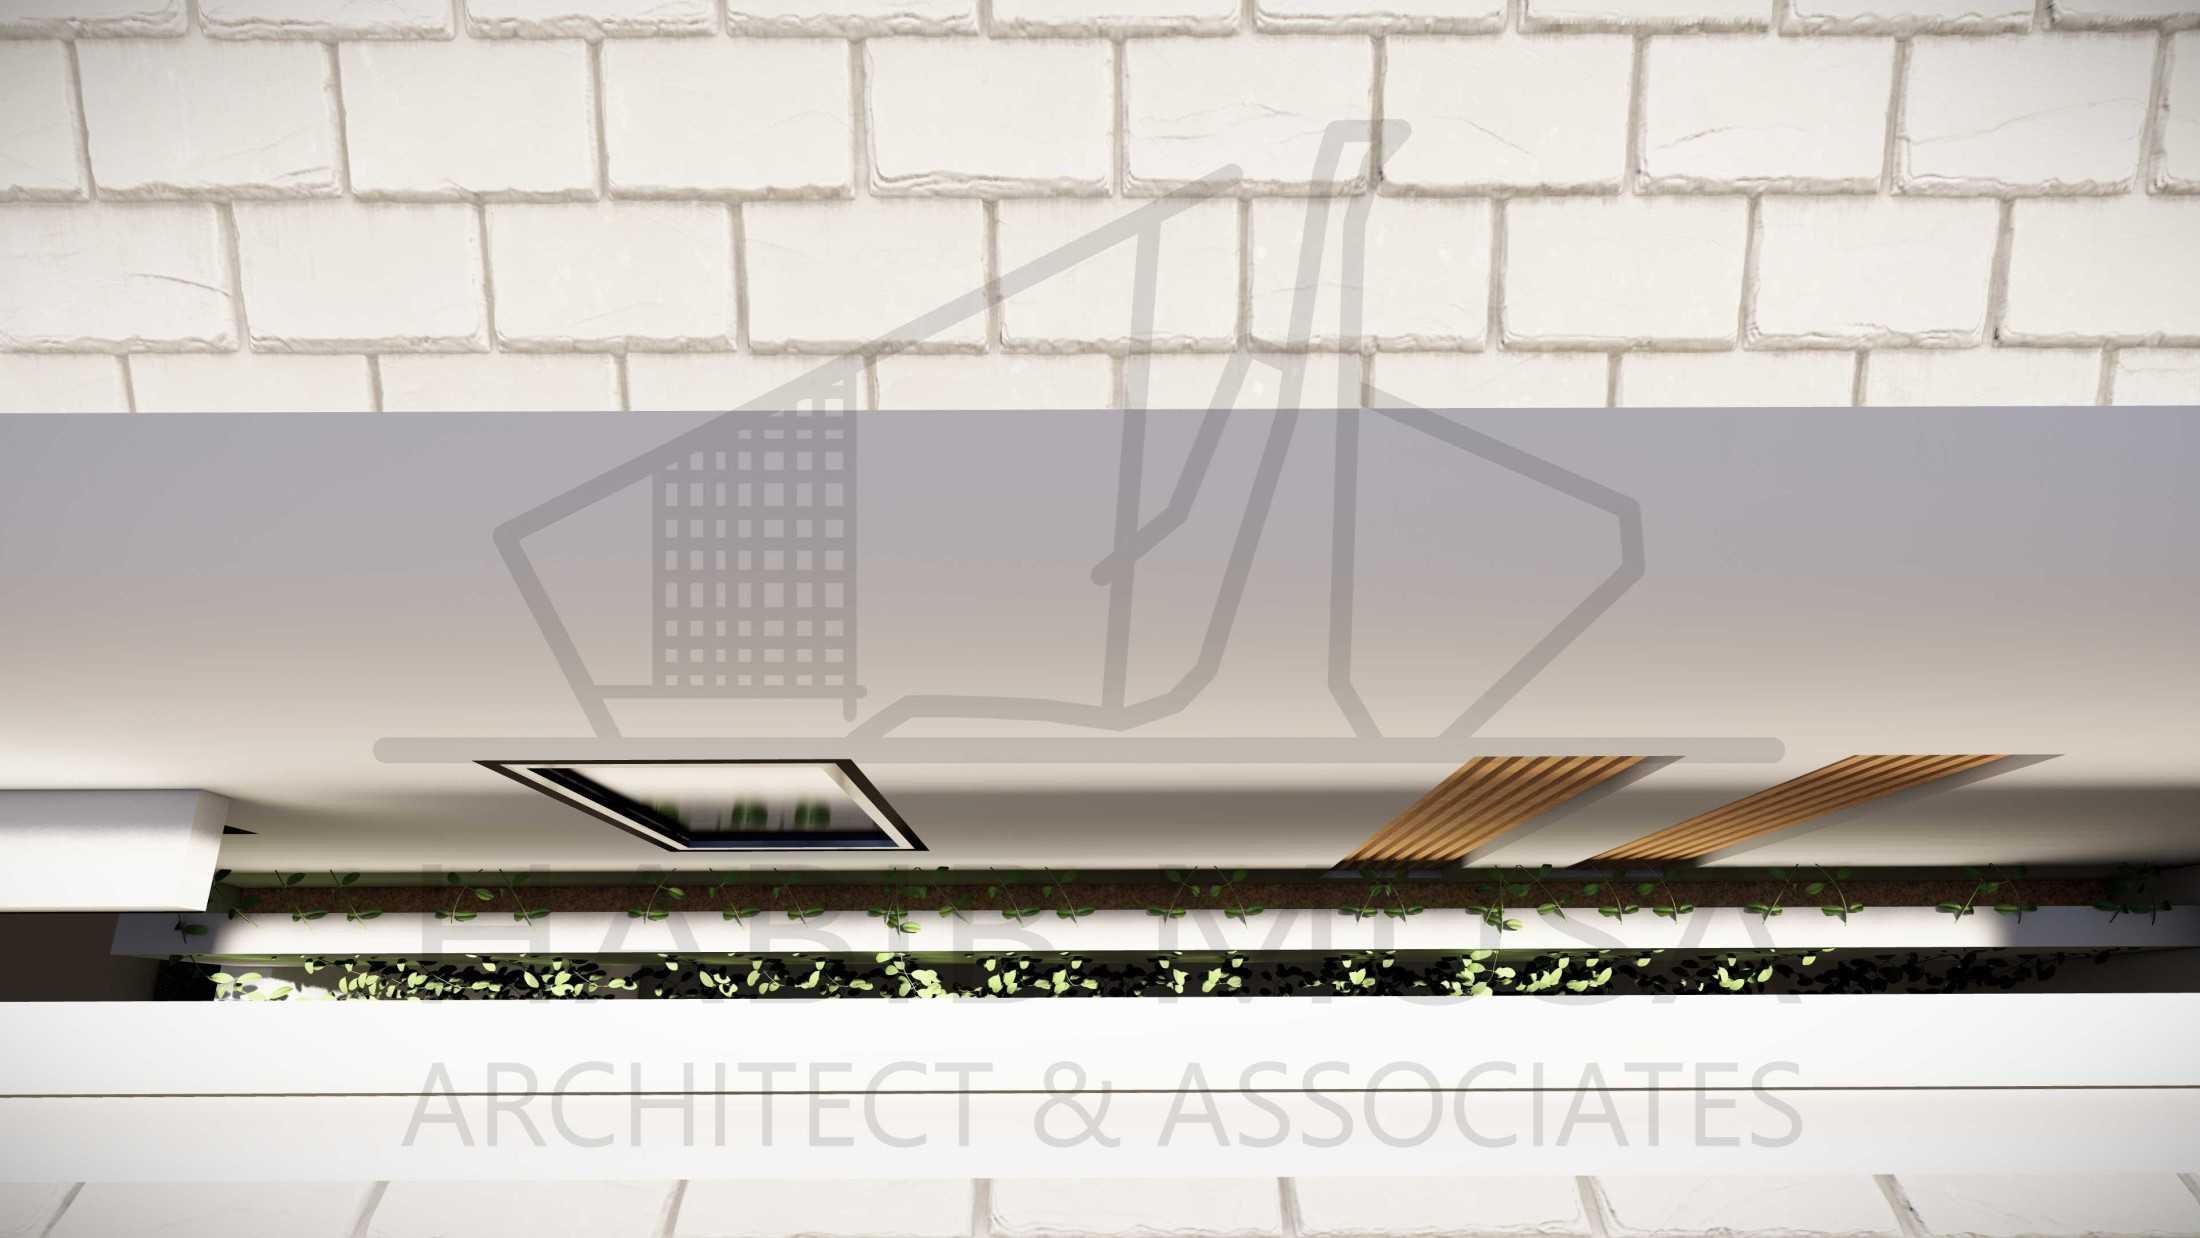 Habib Musa Arsitek Singhamerta Type 115/92 Industrial Malang, Kota Malang, Jawa Timur, Indonesia Malang, Kota Malang, Jawa Timur, Indonesia Habib-Musa-Architect-And-Associates-Singhamerta-Type-11592-Industrial  103168